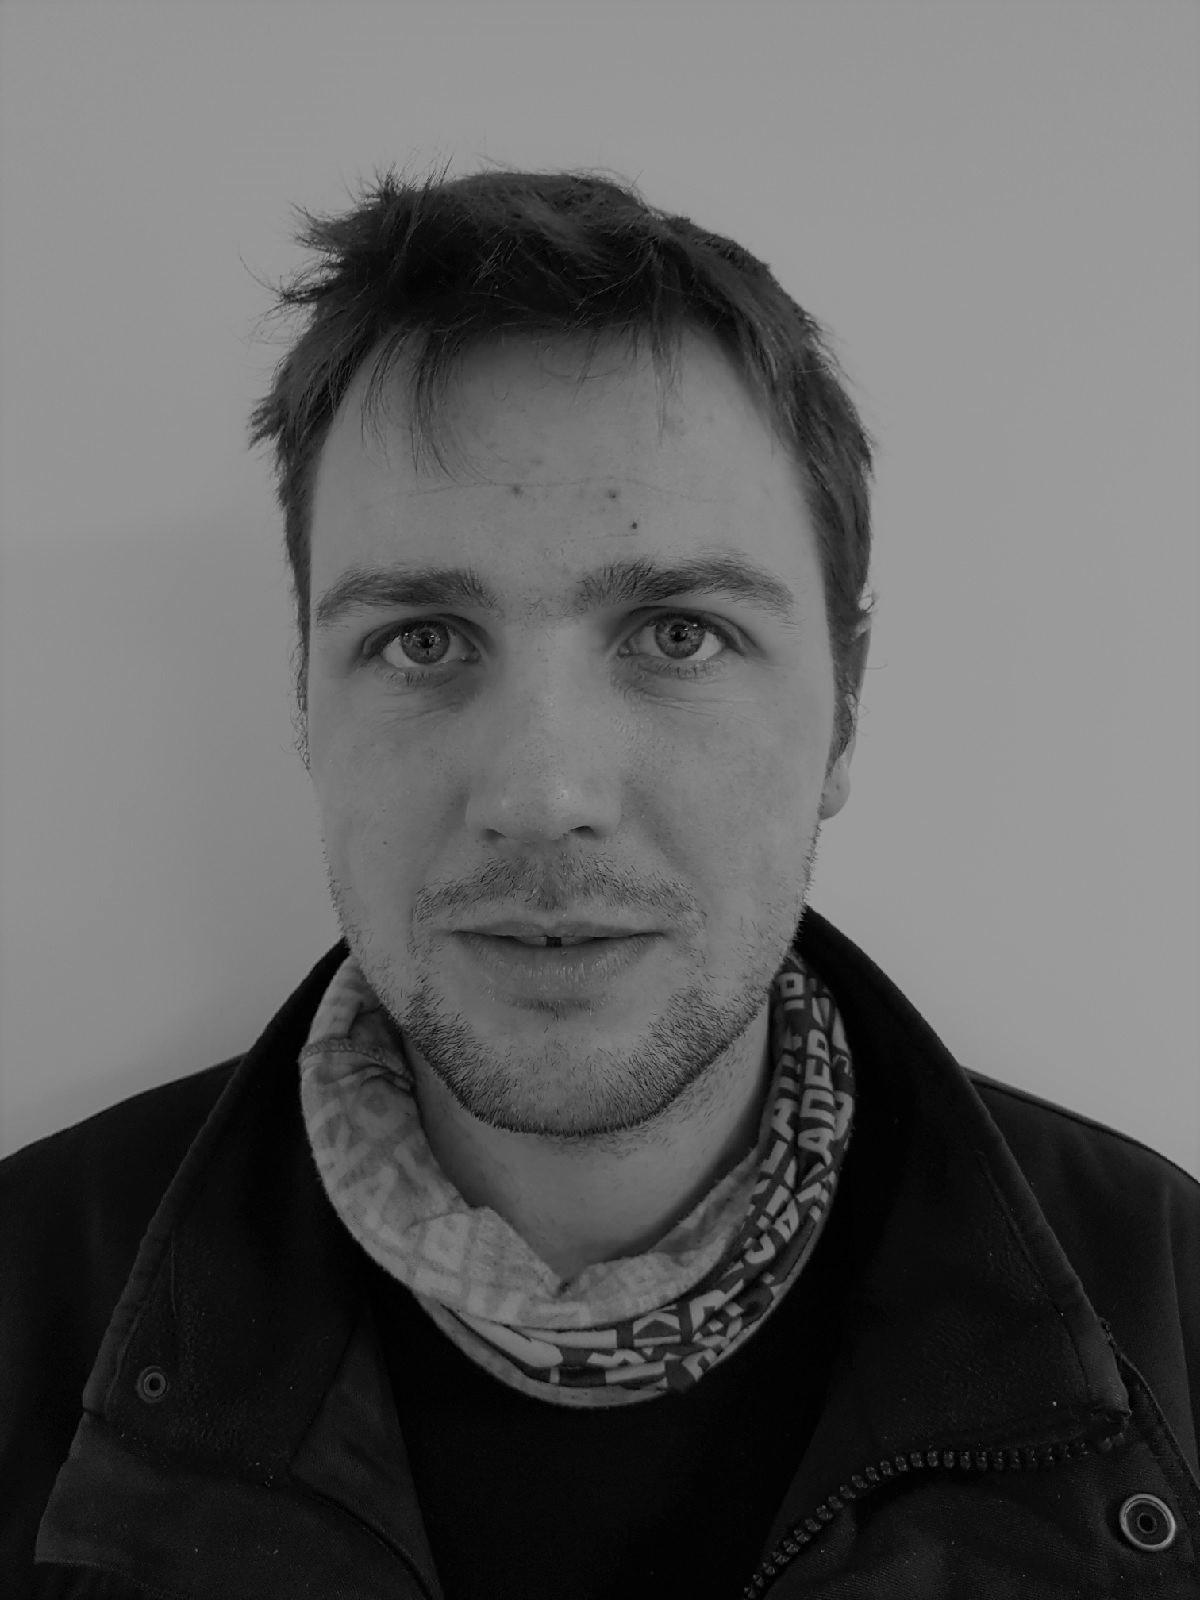 Arne Edvart Olsli